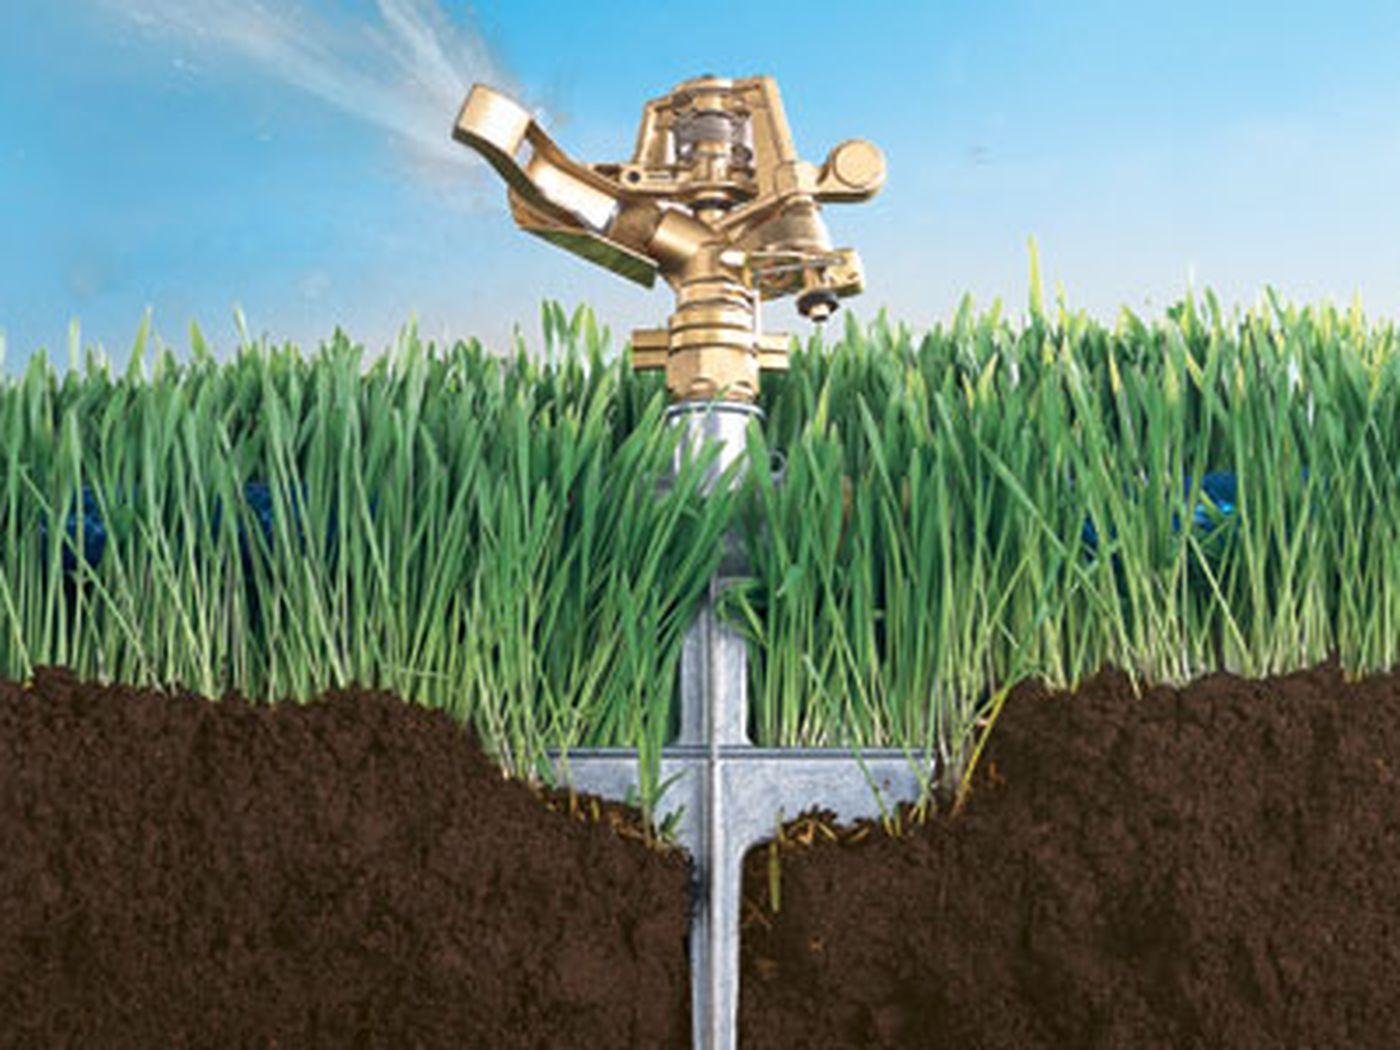 SPRINKLER SOAKER HOSE 50 Ft Garden Lawn Grass Plant Sprinkling Soaking Watering